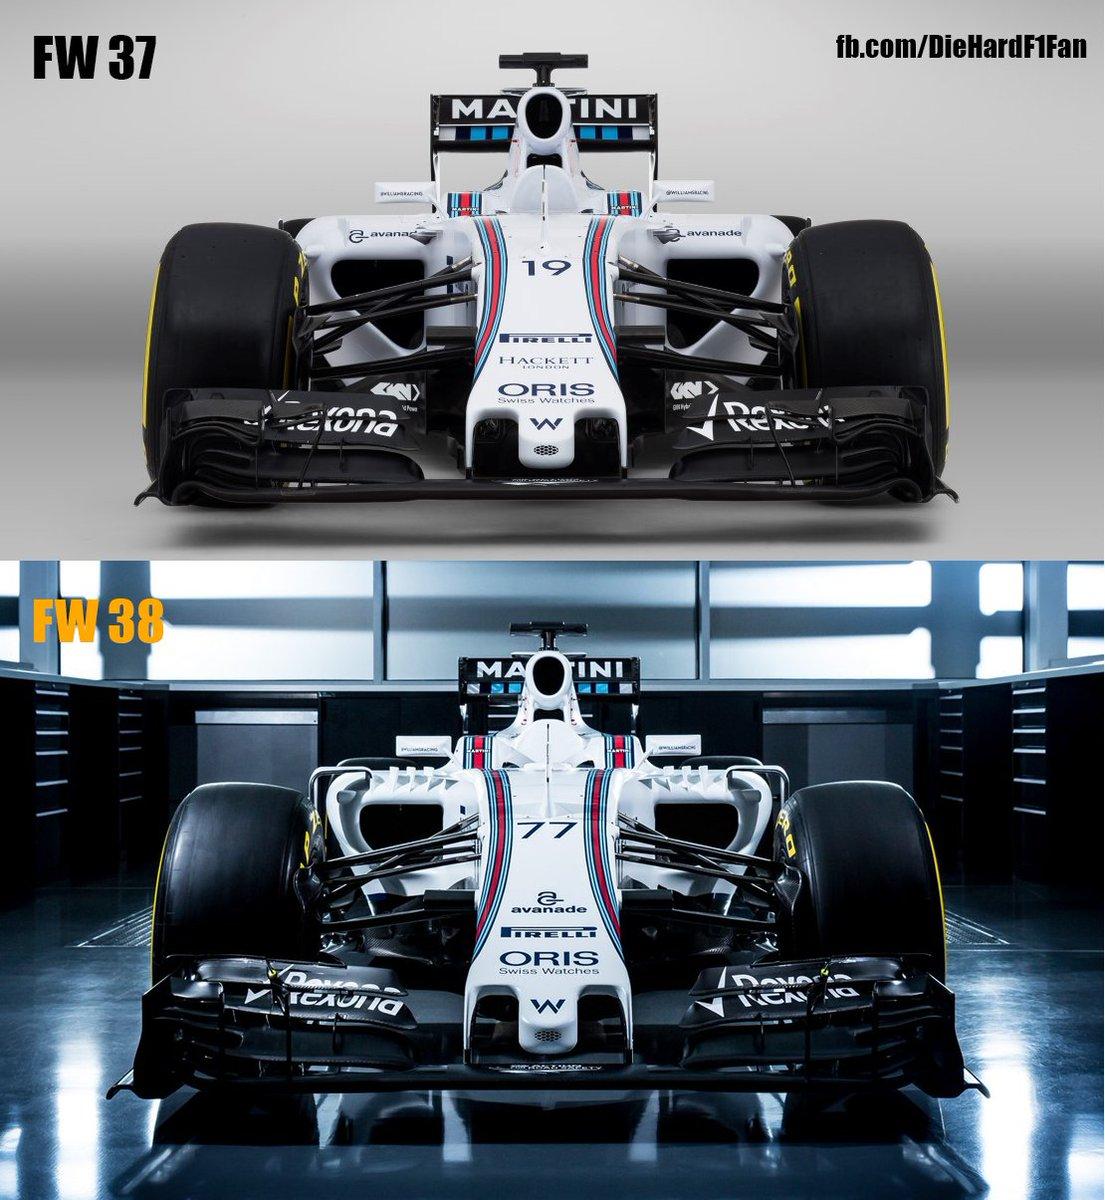 #F1 Compared : @WilliamsRacing FW37 v/s FW 38 https://t.co/DYXCBPqOCQ